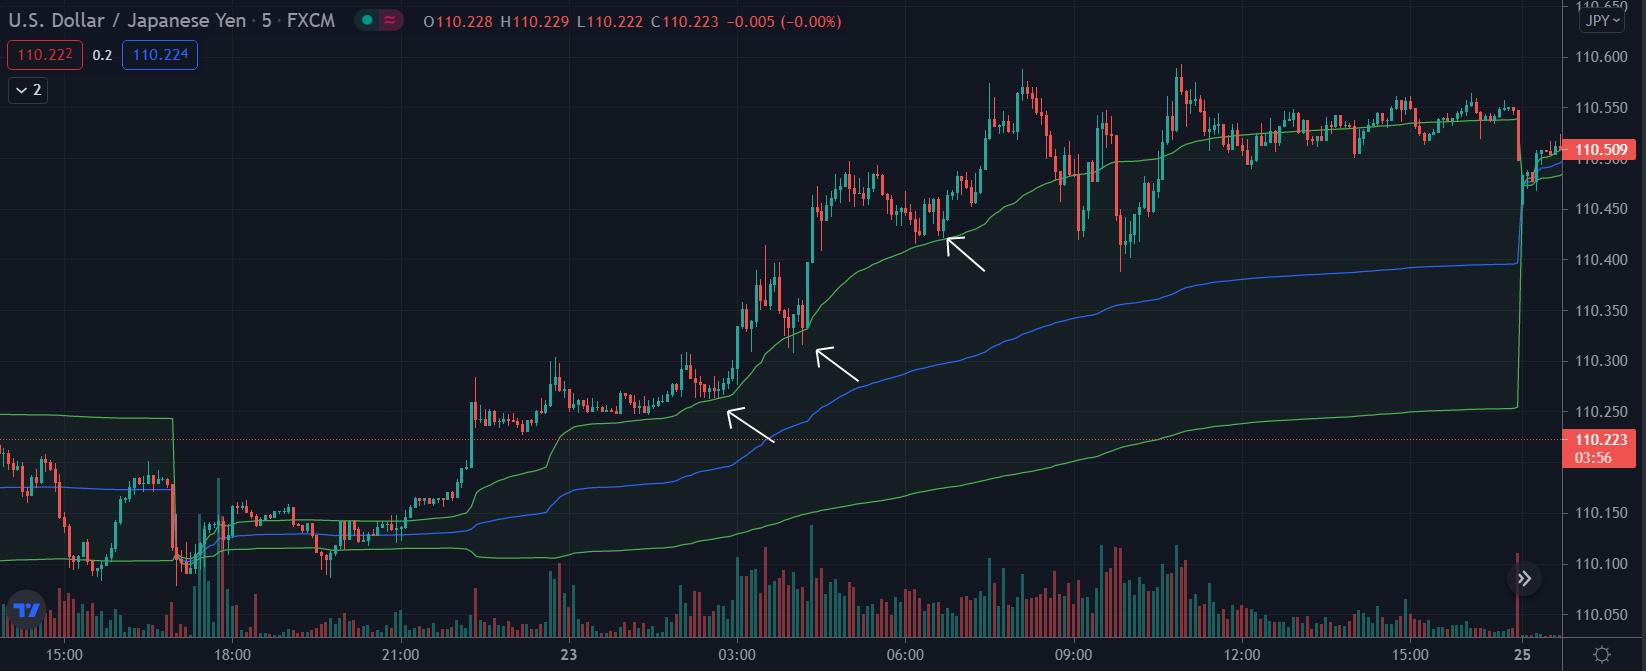 Trading USDJPY using VWAP